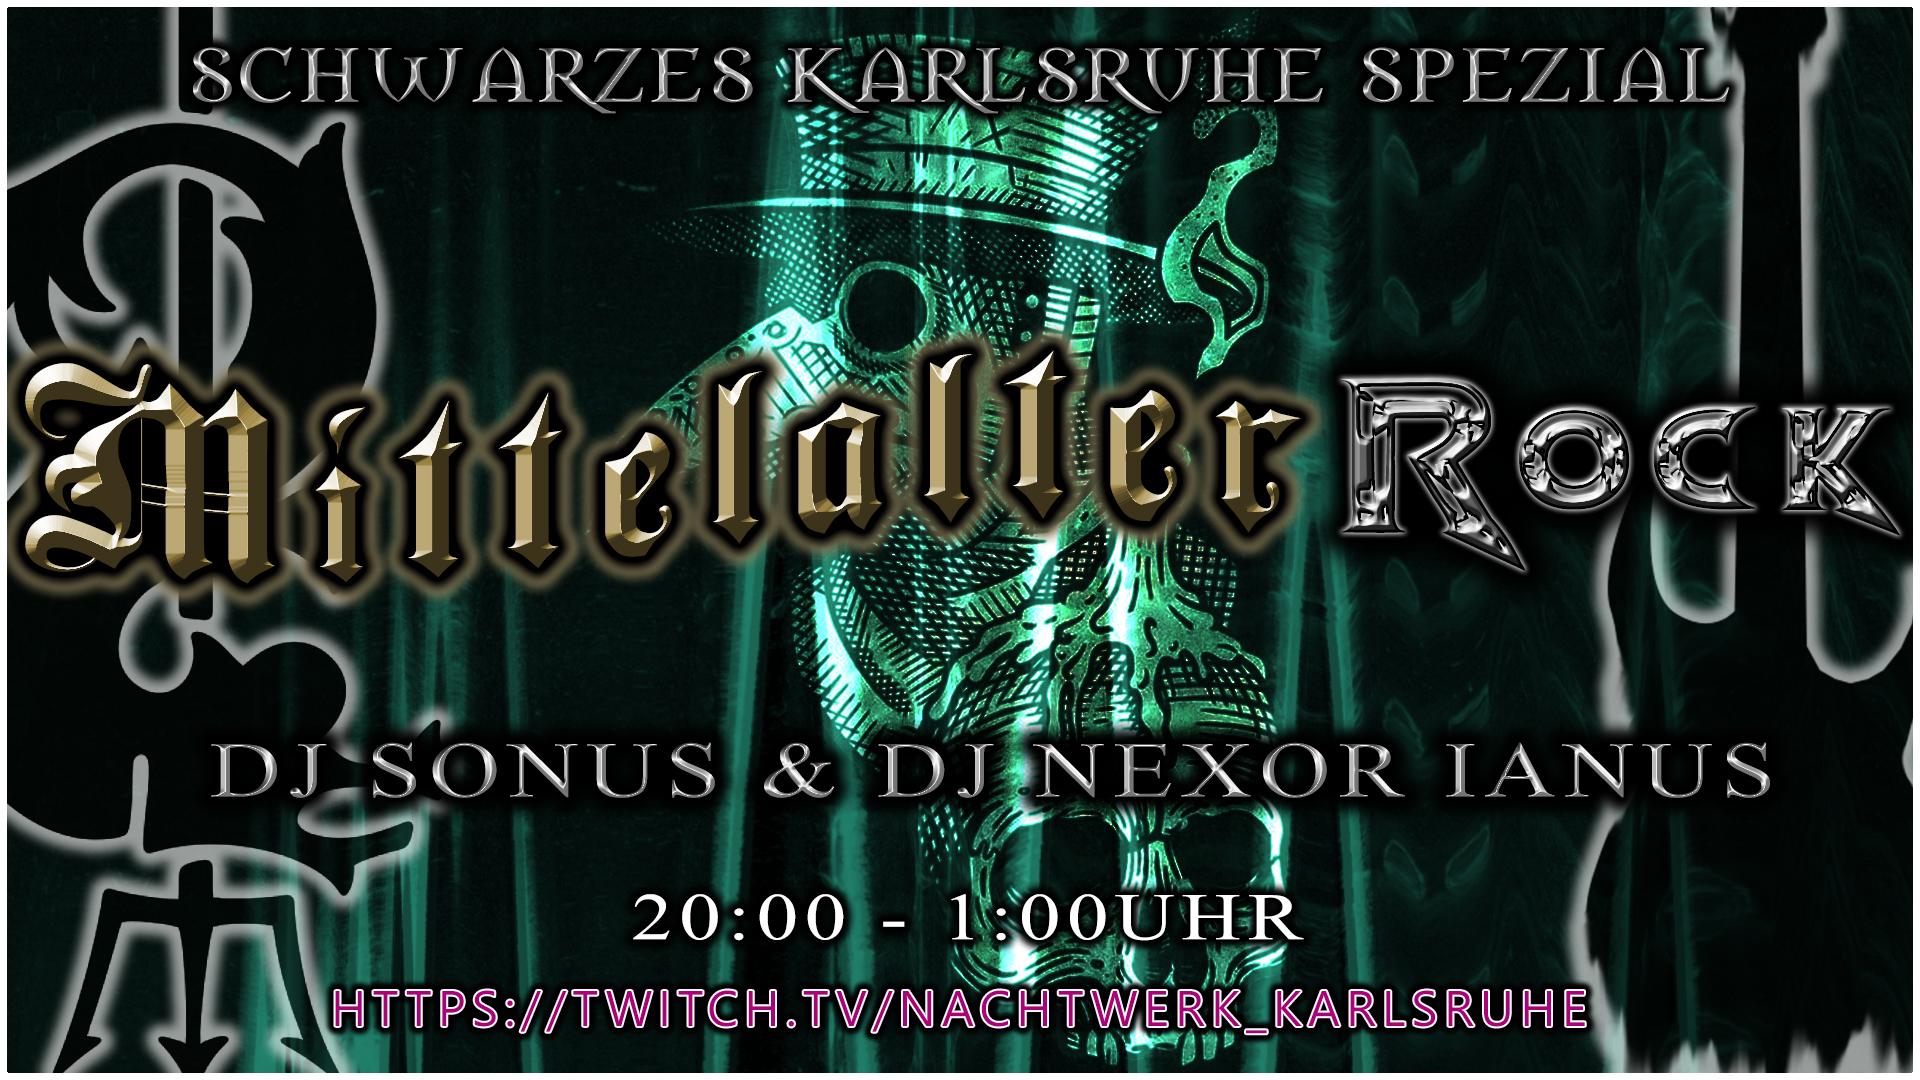 Schwarzes Karlsruhe Spezial - Mittelalter - Rock Live Stream Edition